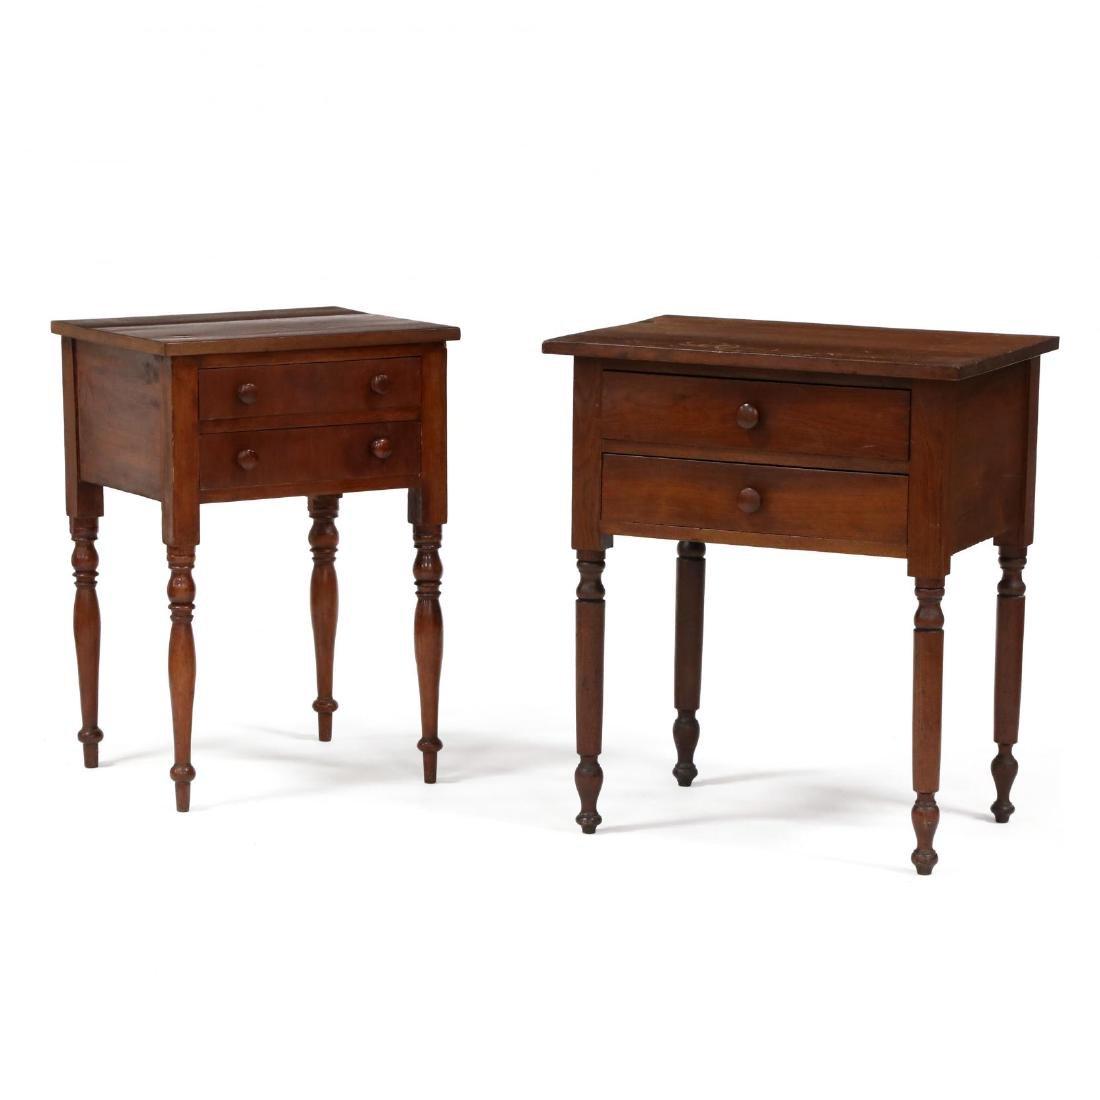 Two Sheraton Walnut Work Tables